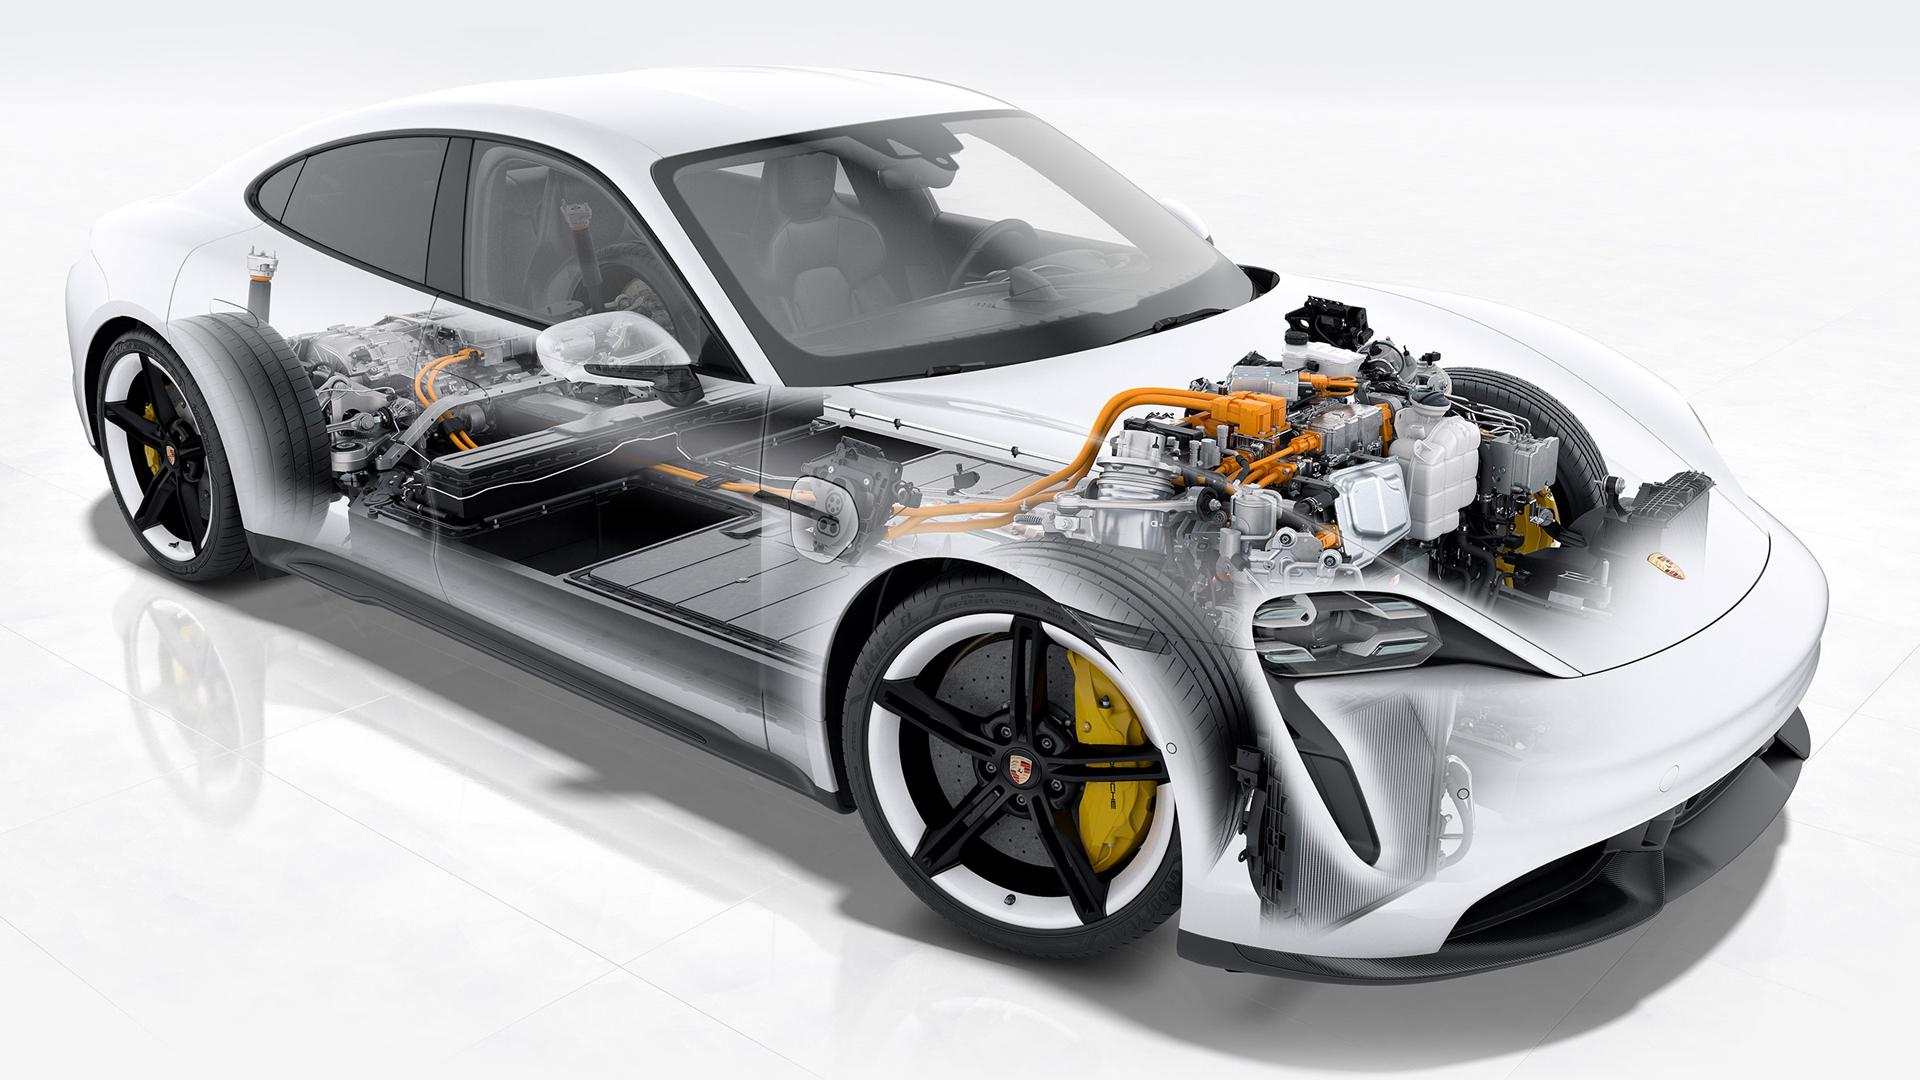 Porsche Taycan - цена, характеристики и фото, описание модели авто